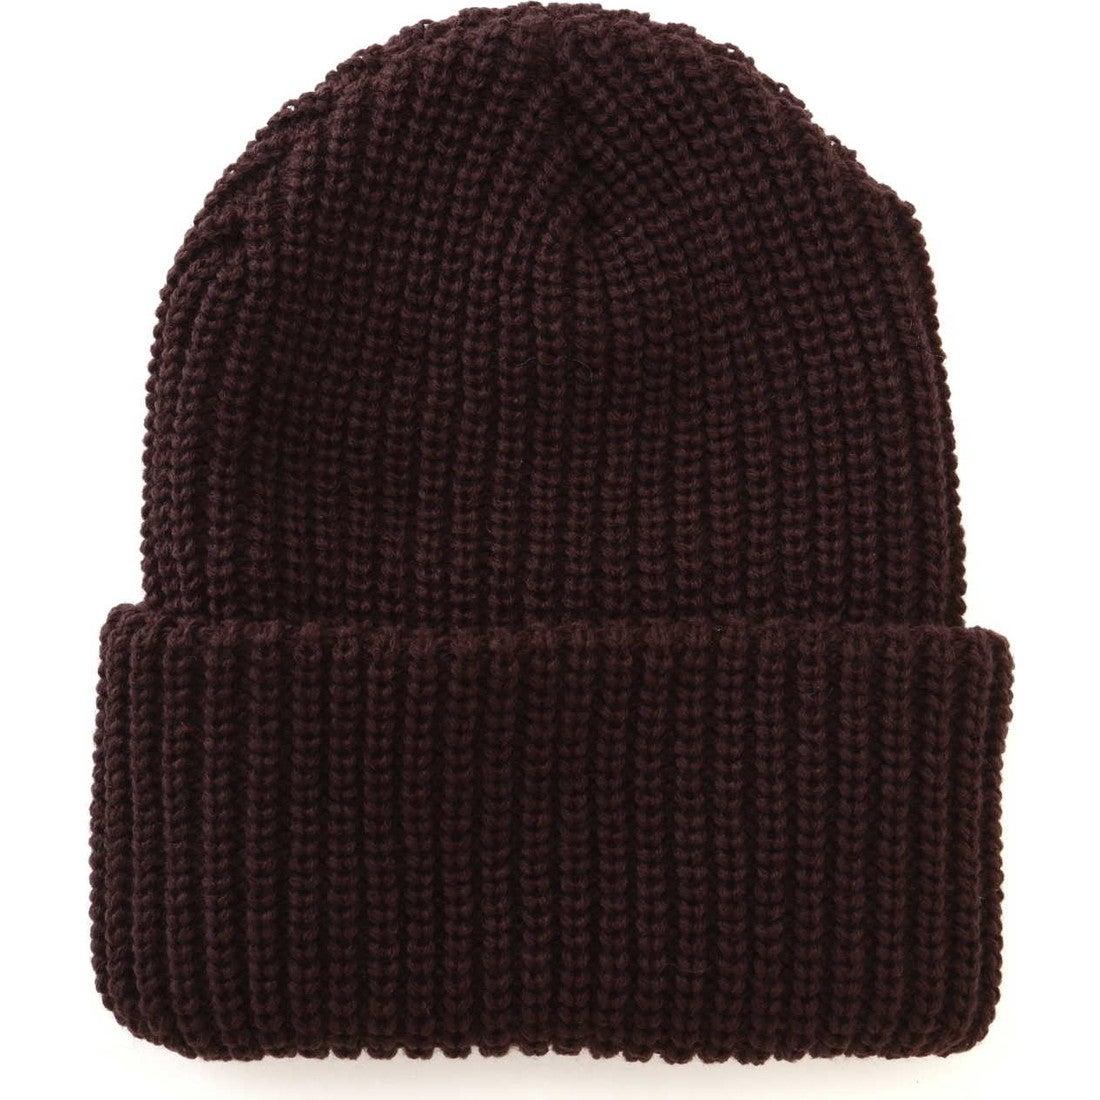 NYHATニット帽BROWN1